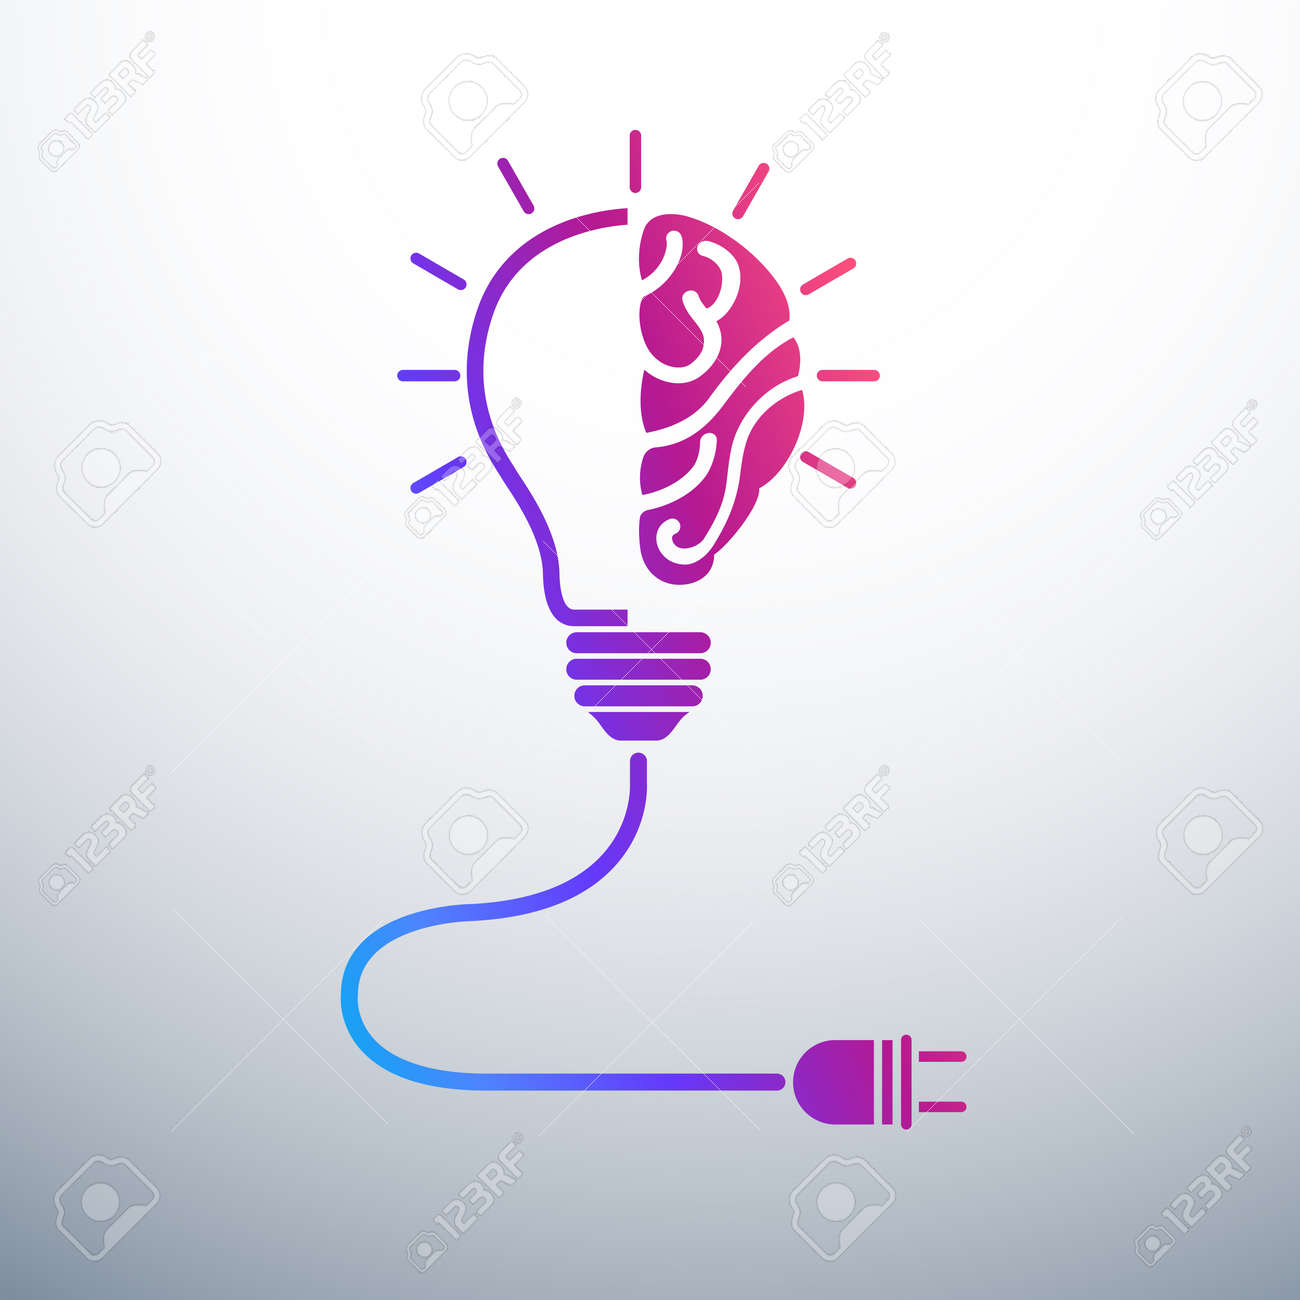 Creative Brain Idea Concept With Light Bulb And Plug Icon ,vector  Illustration Stock Vector